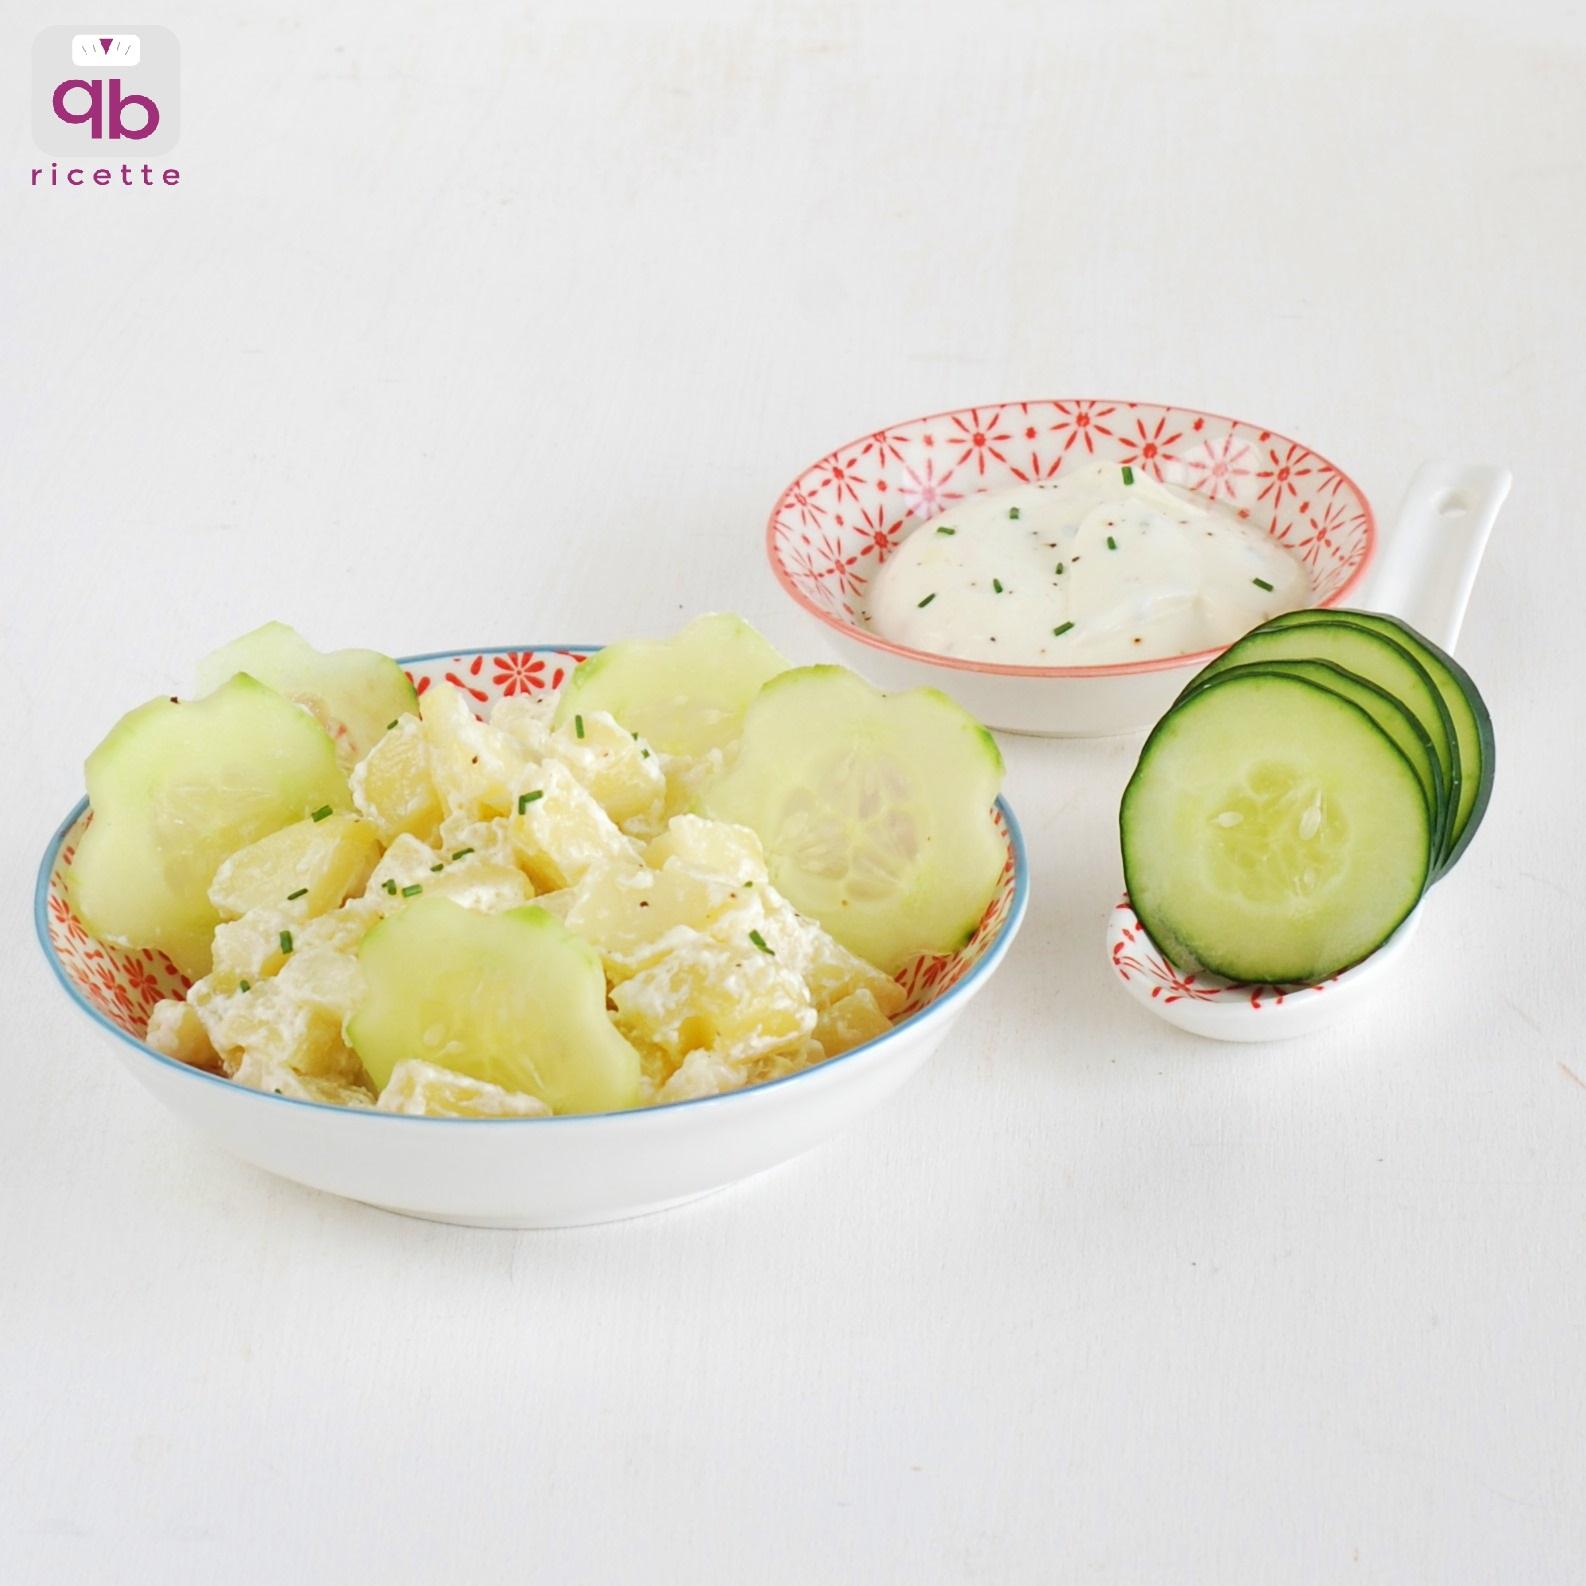 insalata patate e cetrioli